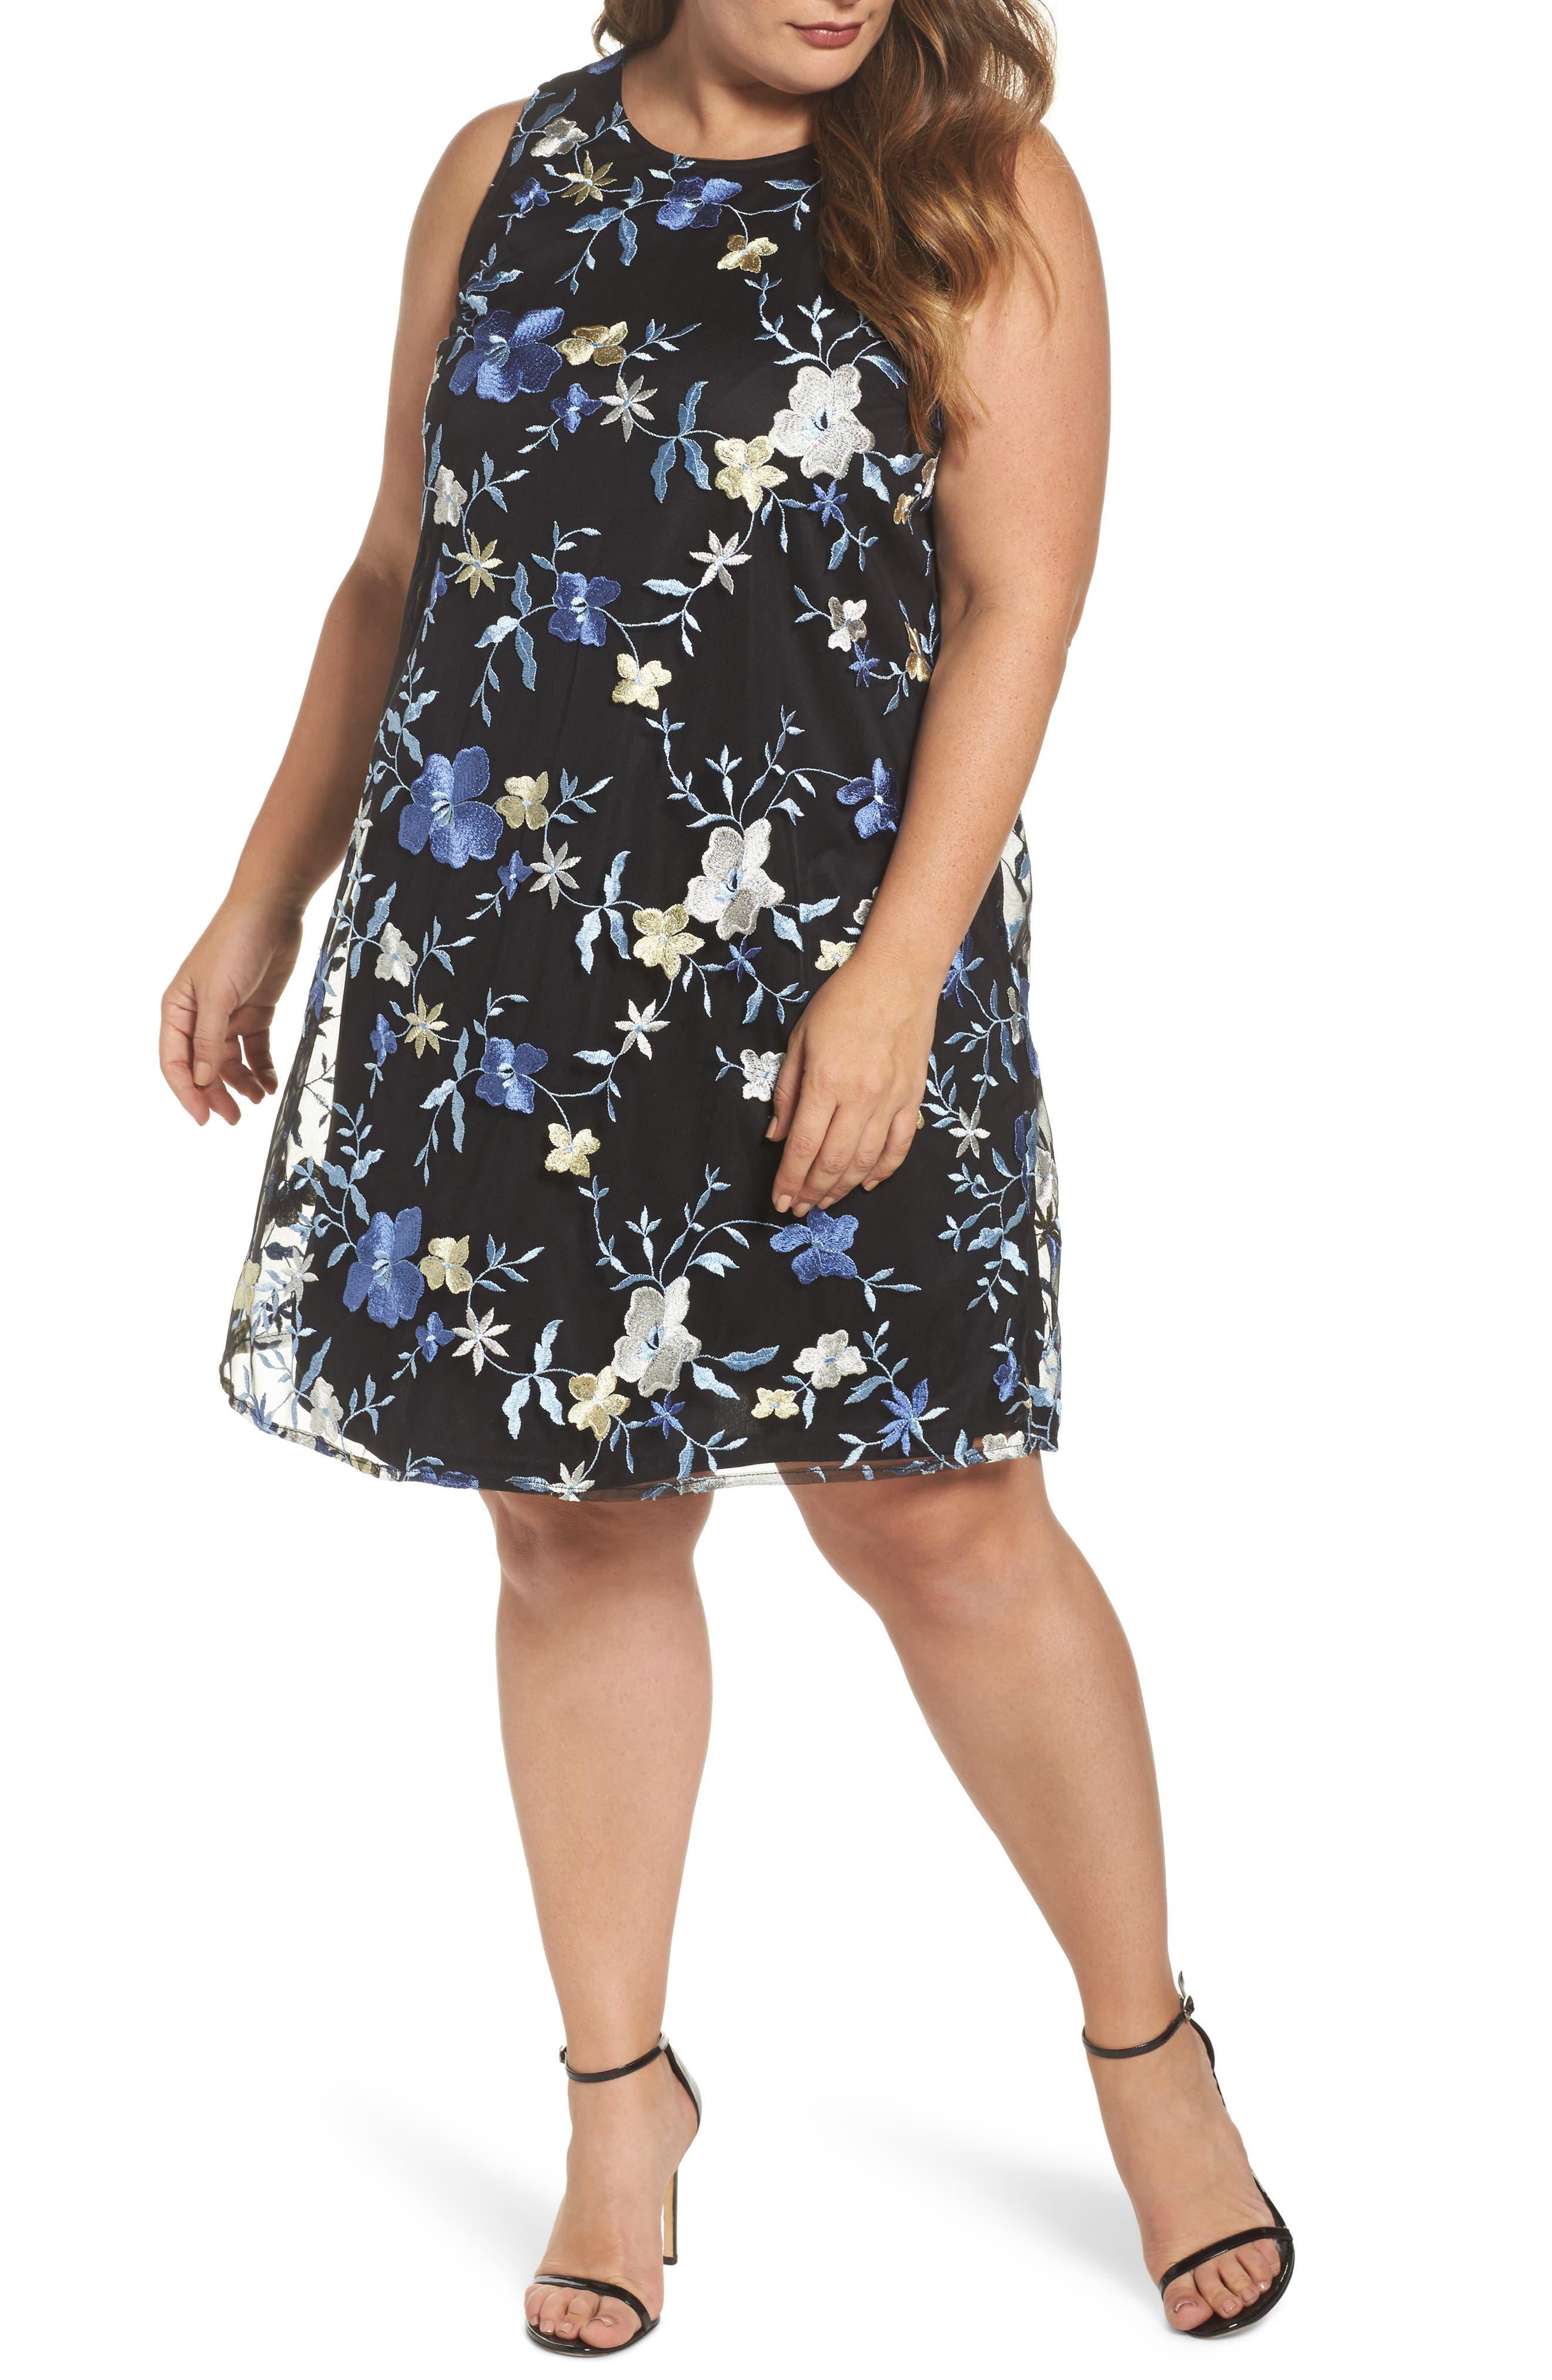 Floral Embroidered A-Line Dress,                         Main,                         color, Black/ Blue